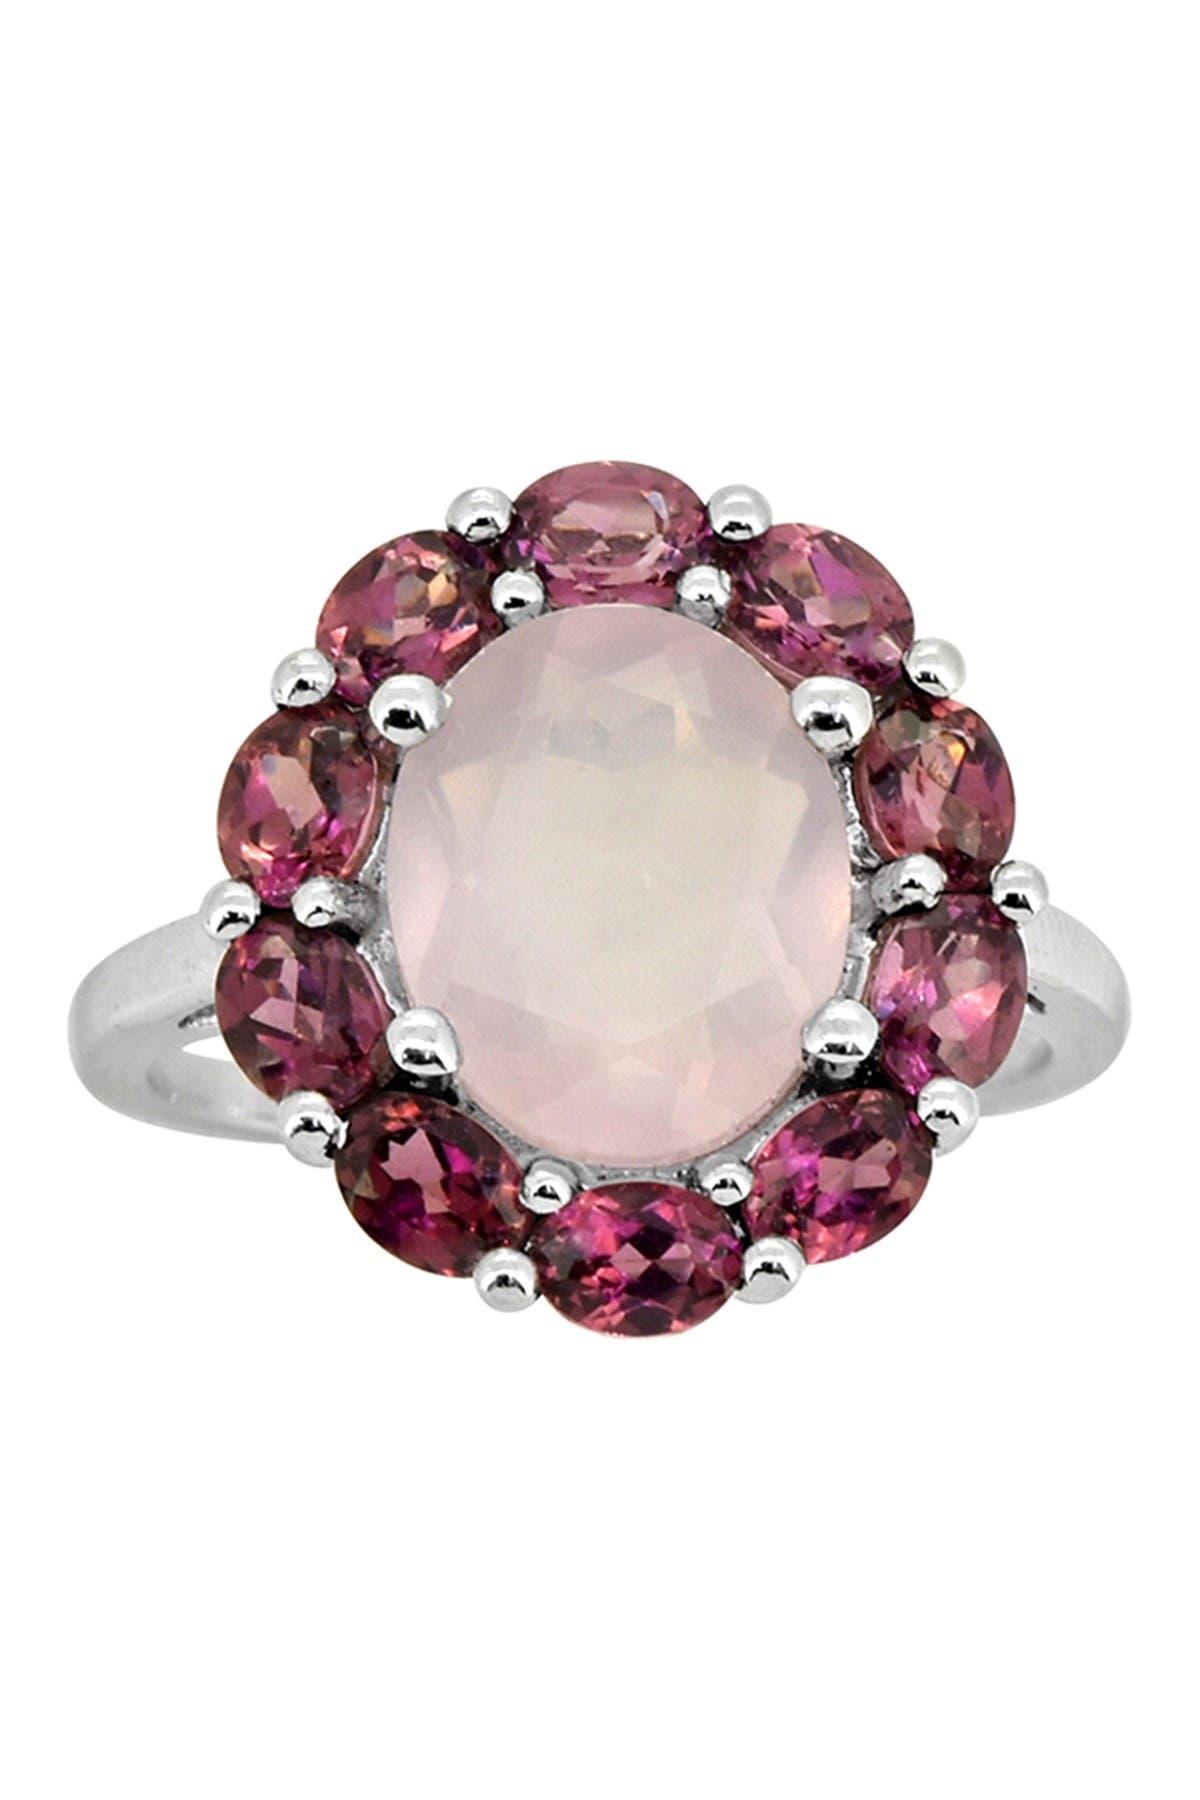 35x35mm New Arrival Pink Raspberry Rhodolite Garnet Woman/'s Silver Ring Us 8.0#